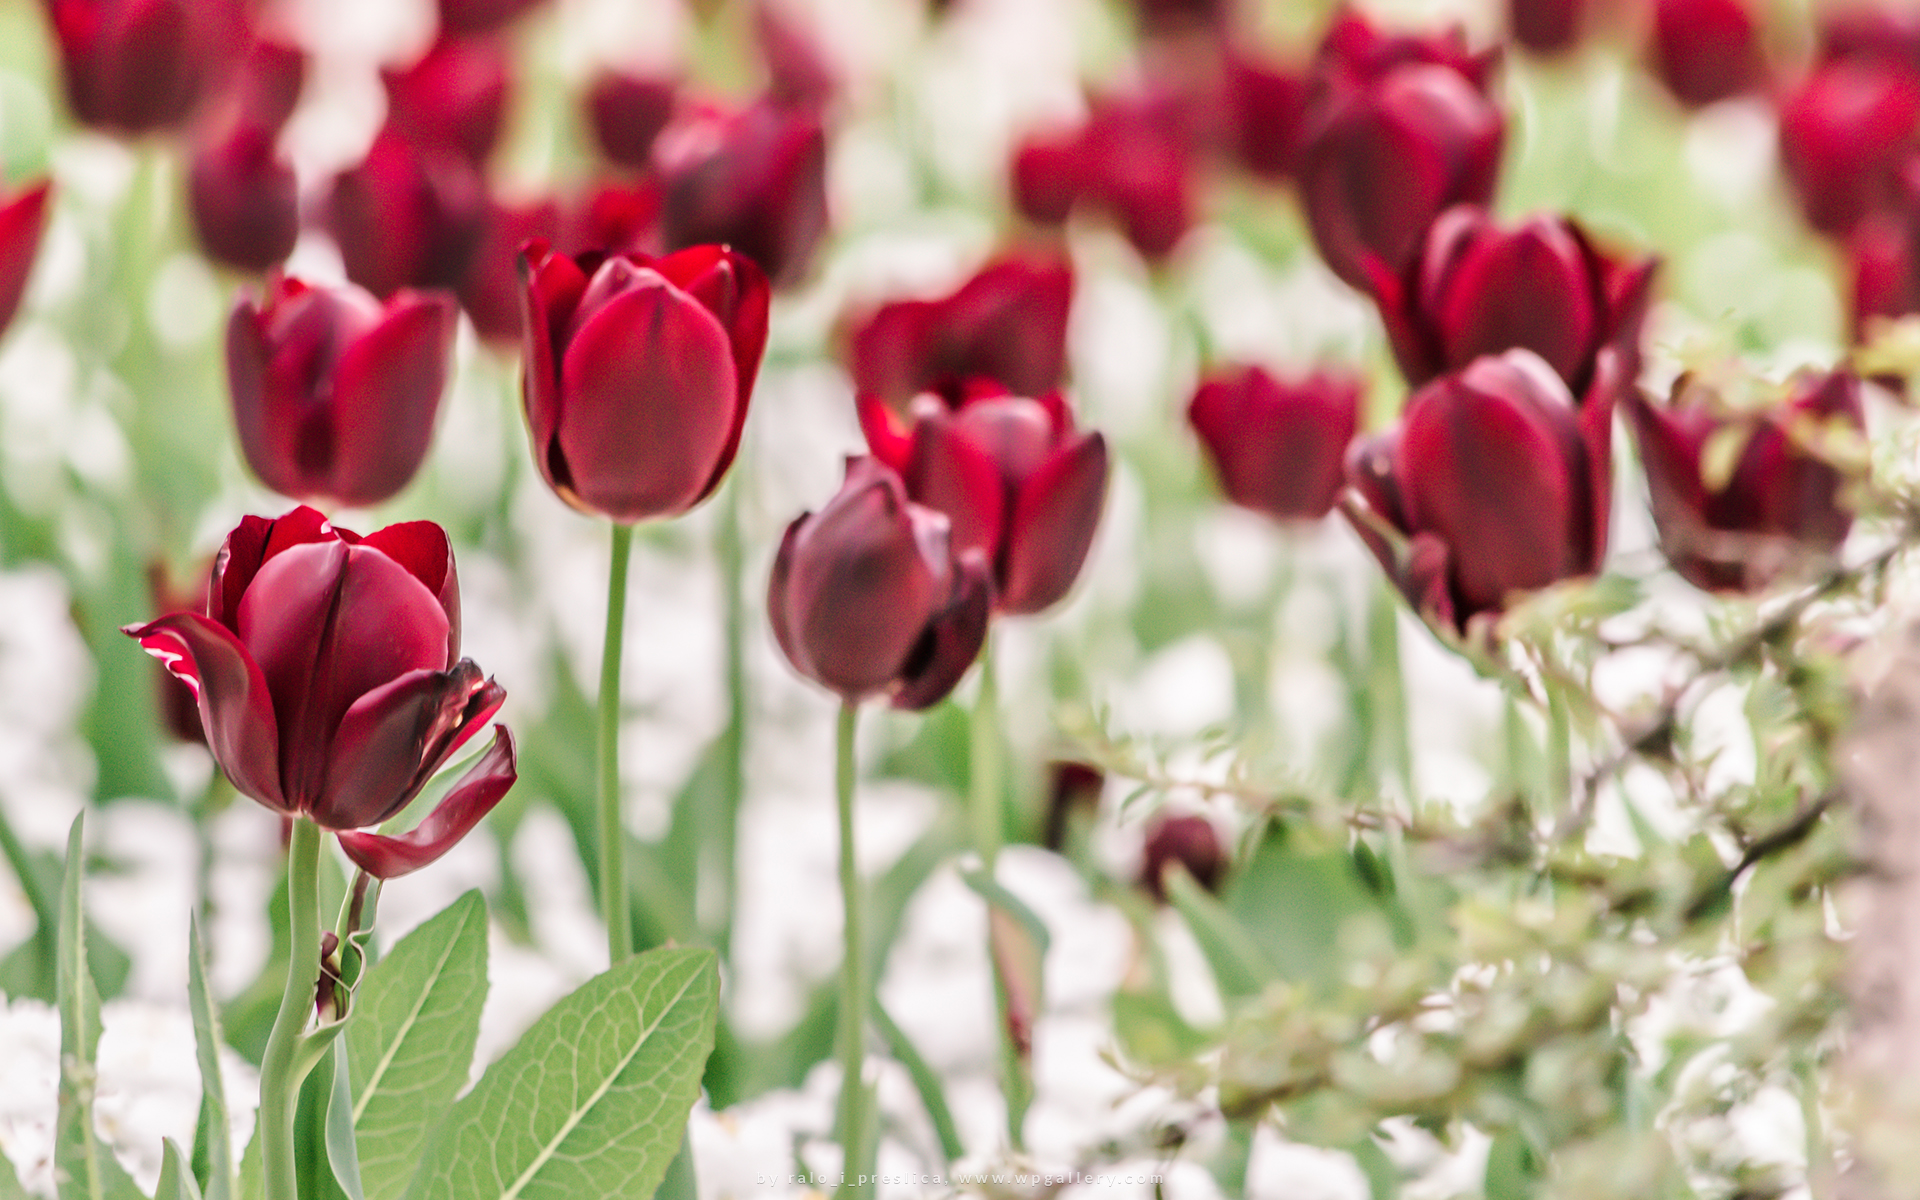 Red Tulip Field by ralo_i_preslica